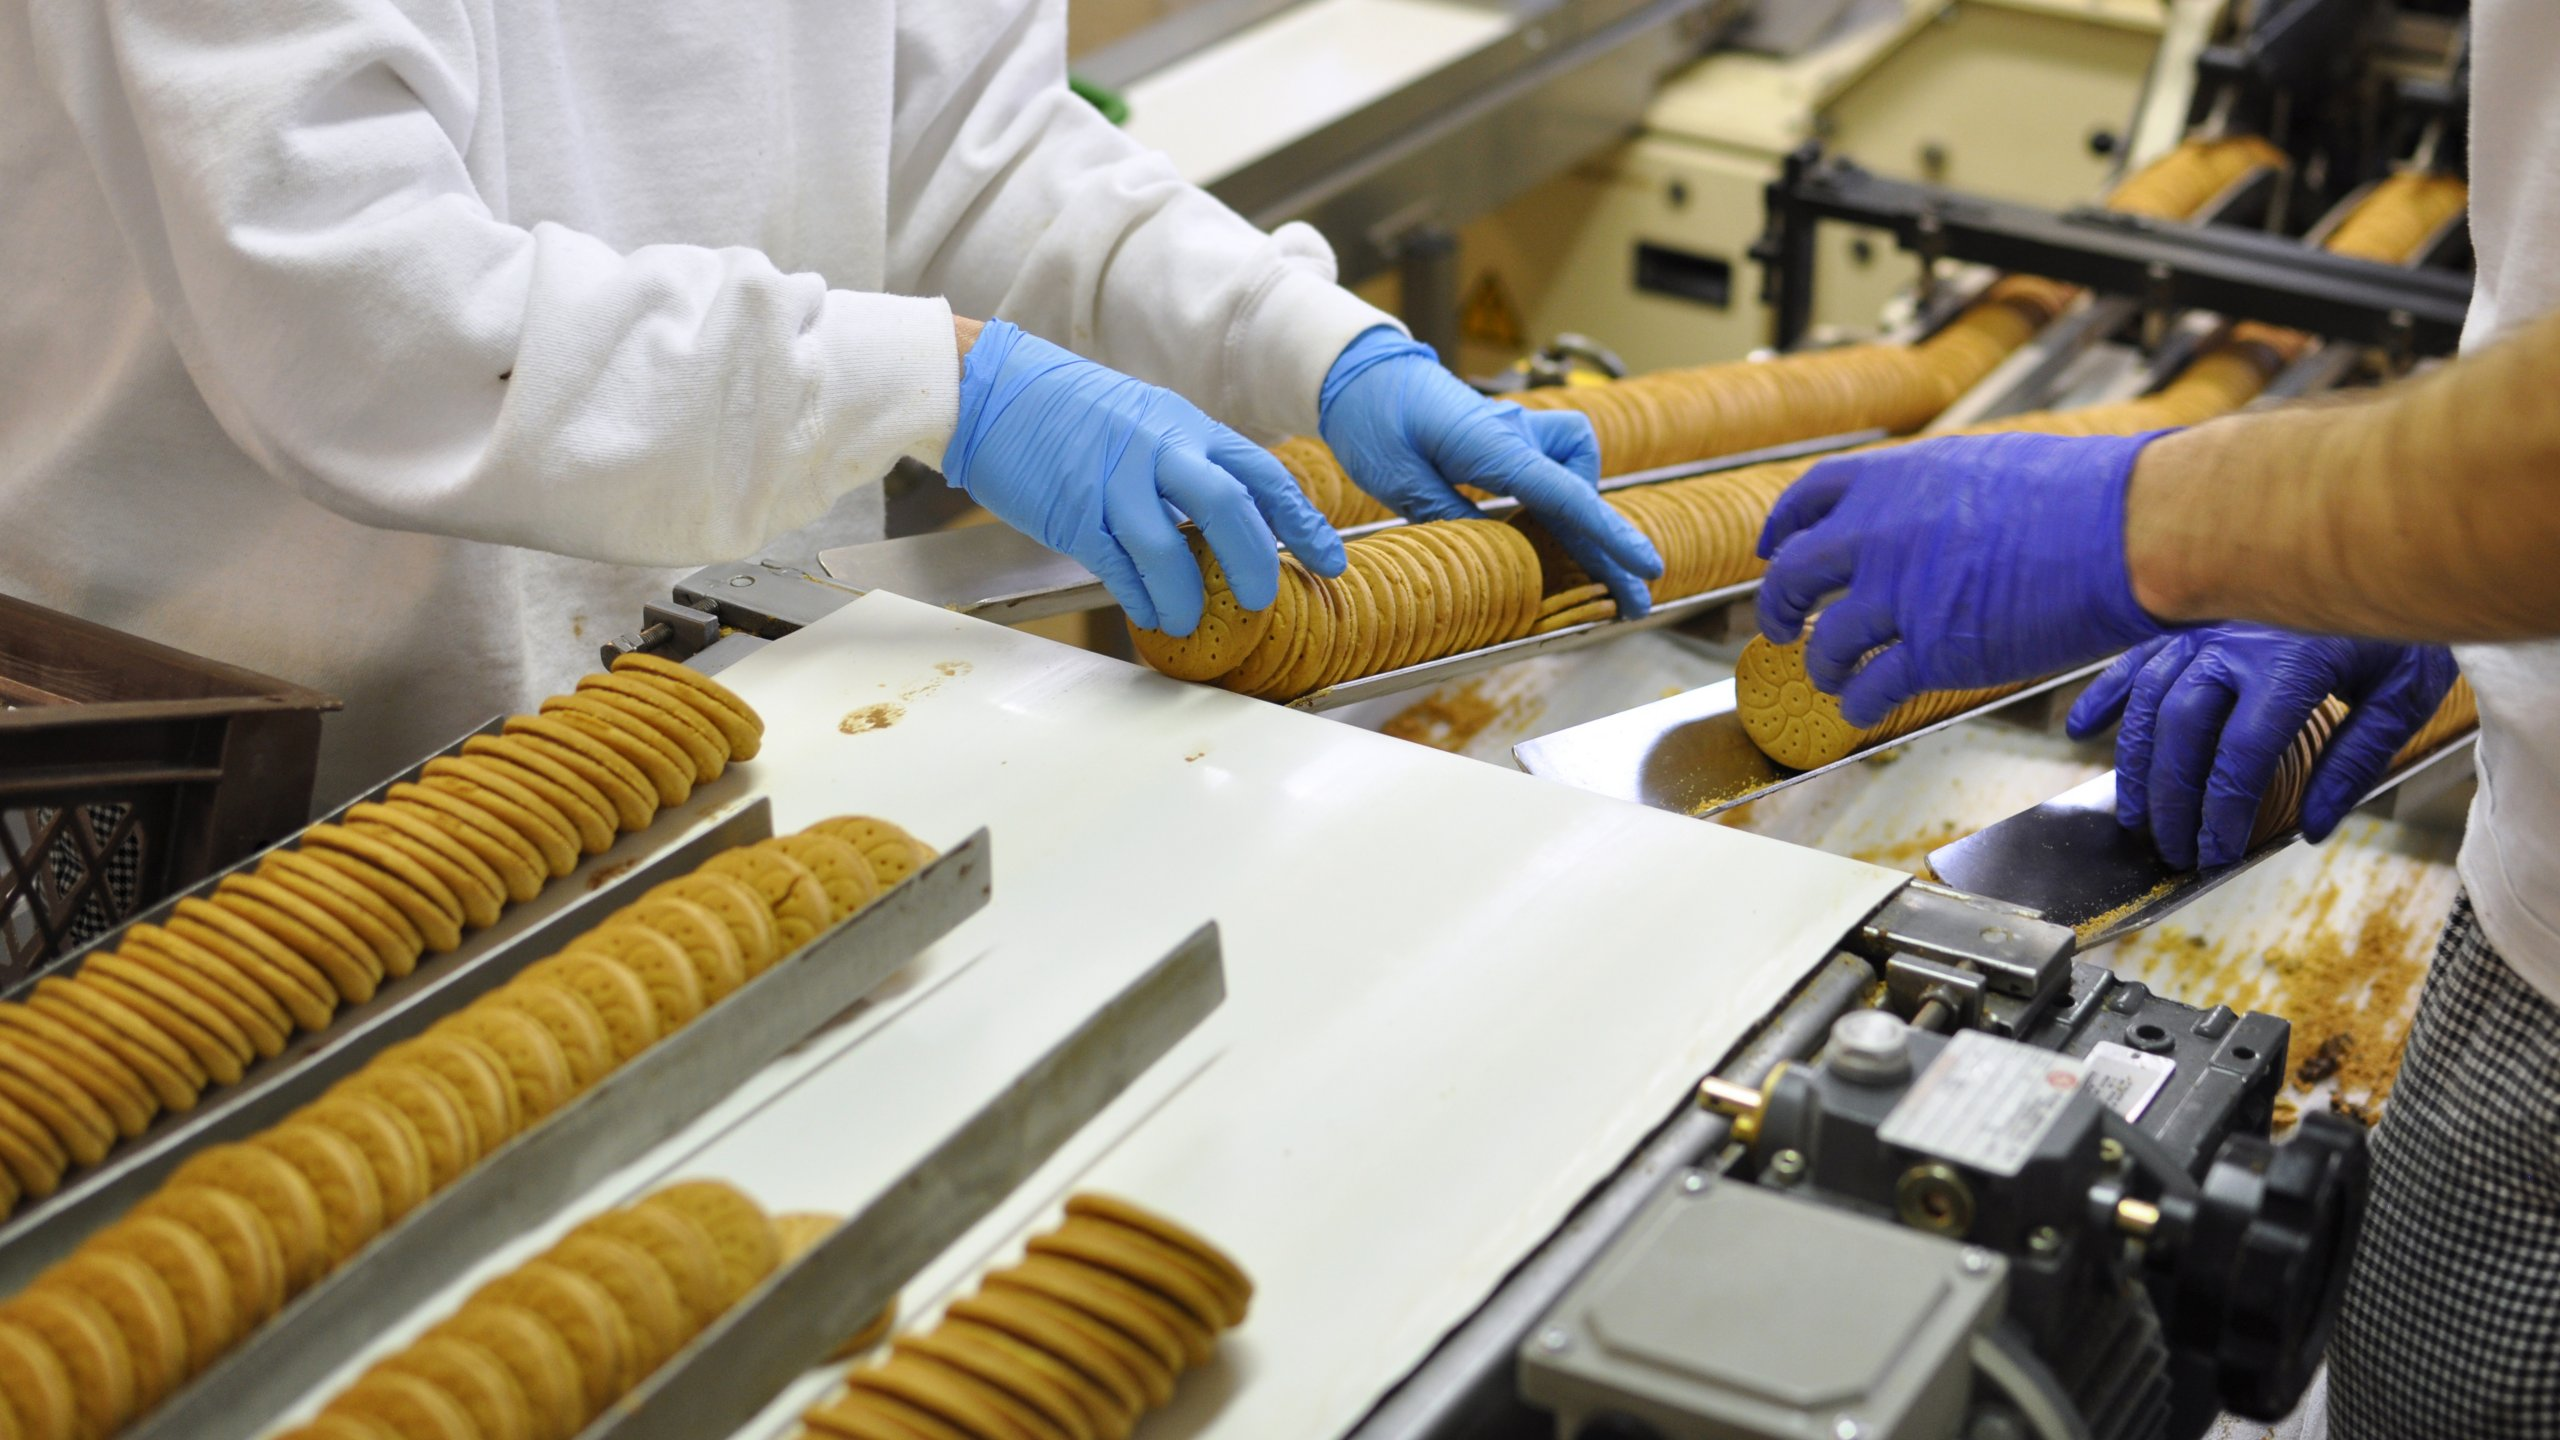 Fliessbandarbeit Lebensmittelindustrie / assembly line work